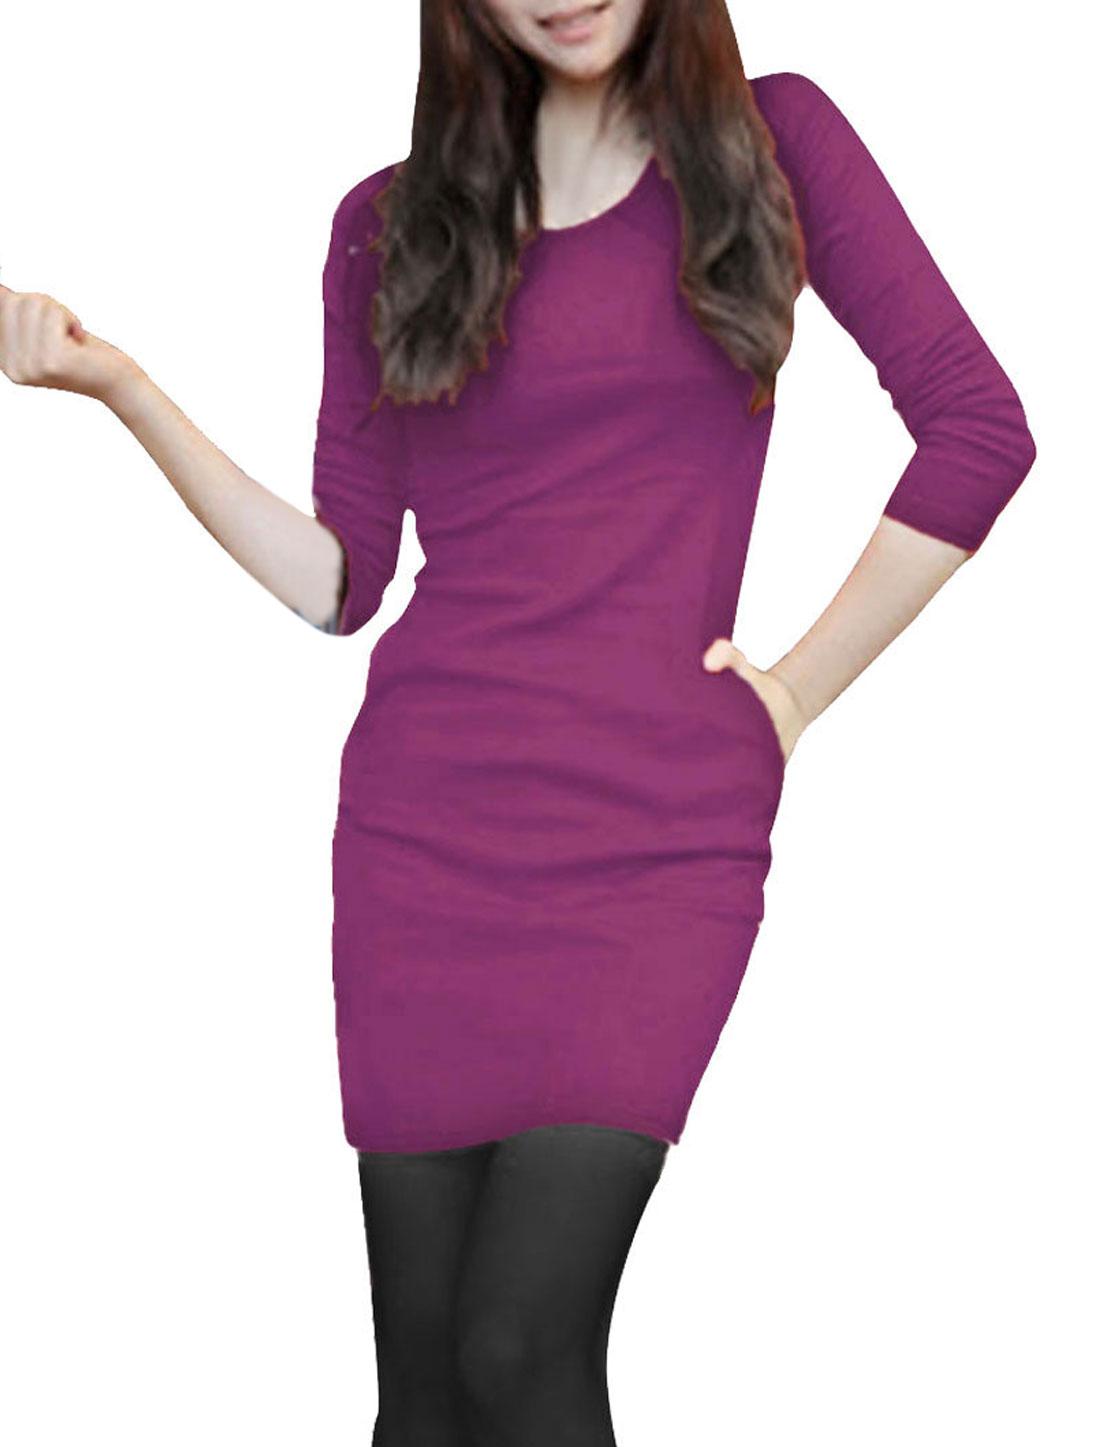 Ladies Purple Long Sleeves Skinny Casual Sexy Tunic Shirt XS